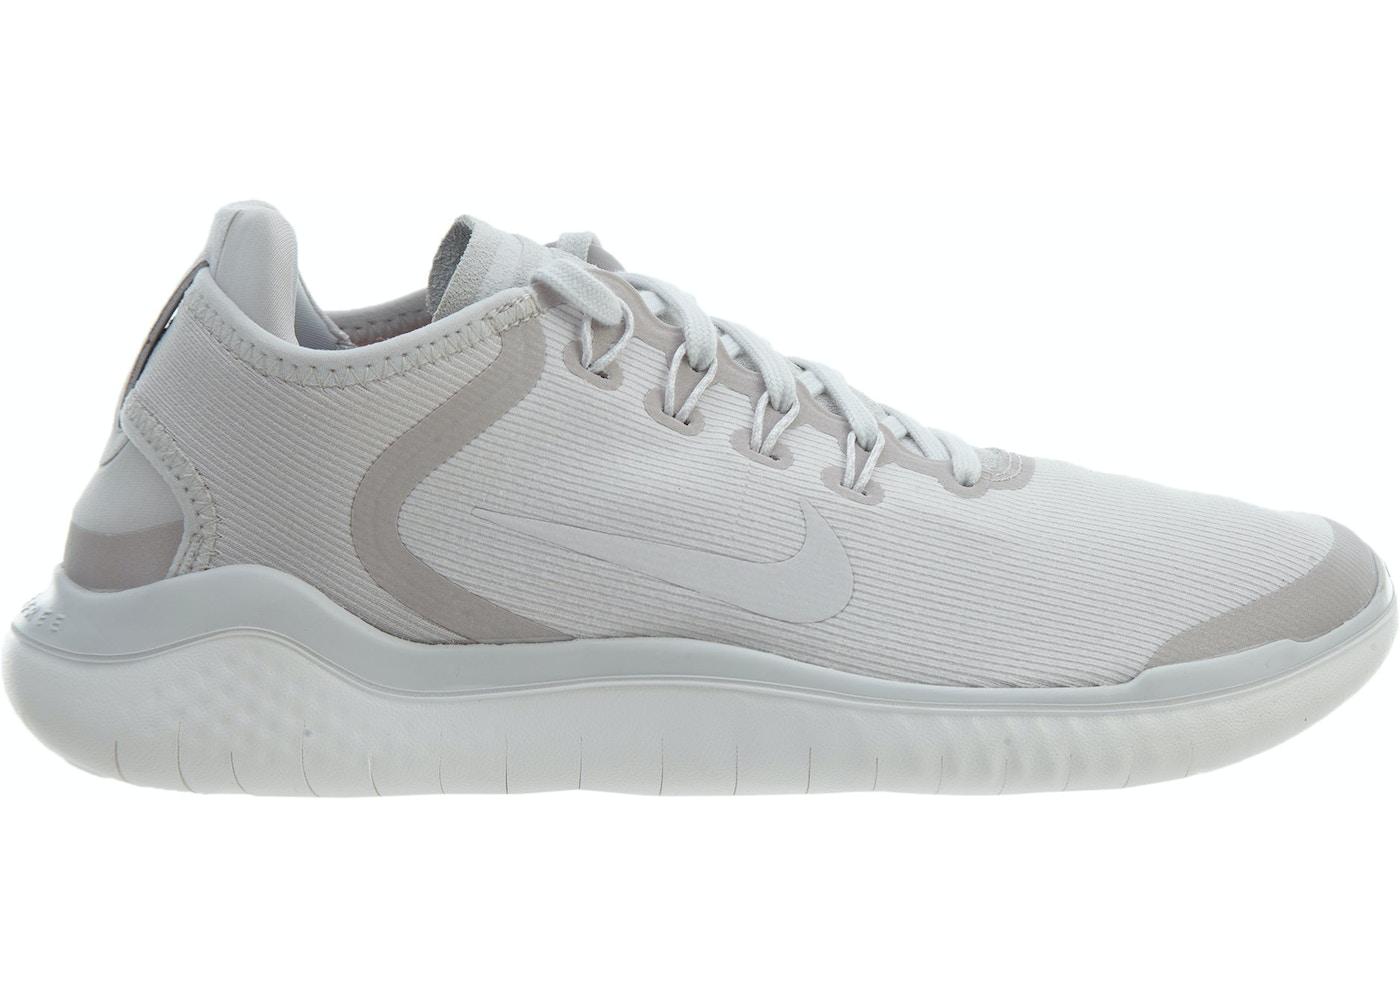 c7659e6bbfe8 Nike Free Rn 2018 Sun Vast Grey Summit White - AH5207-001